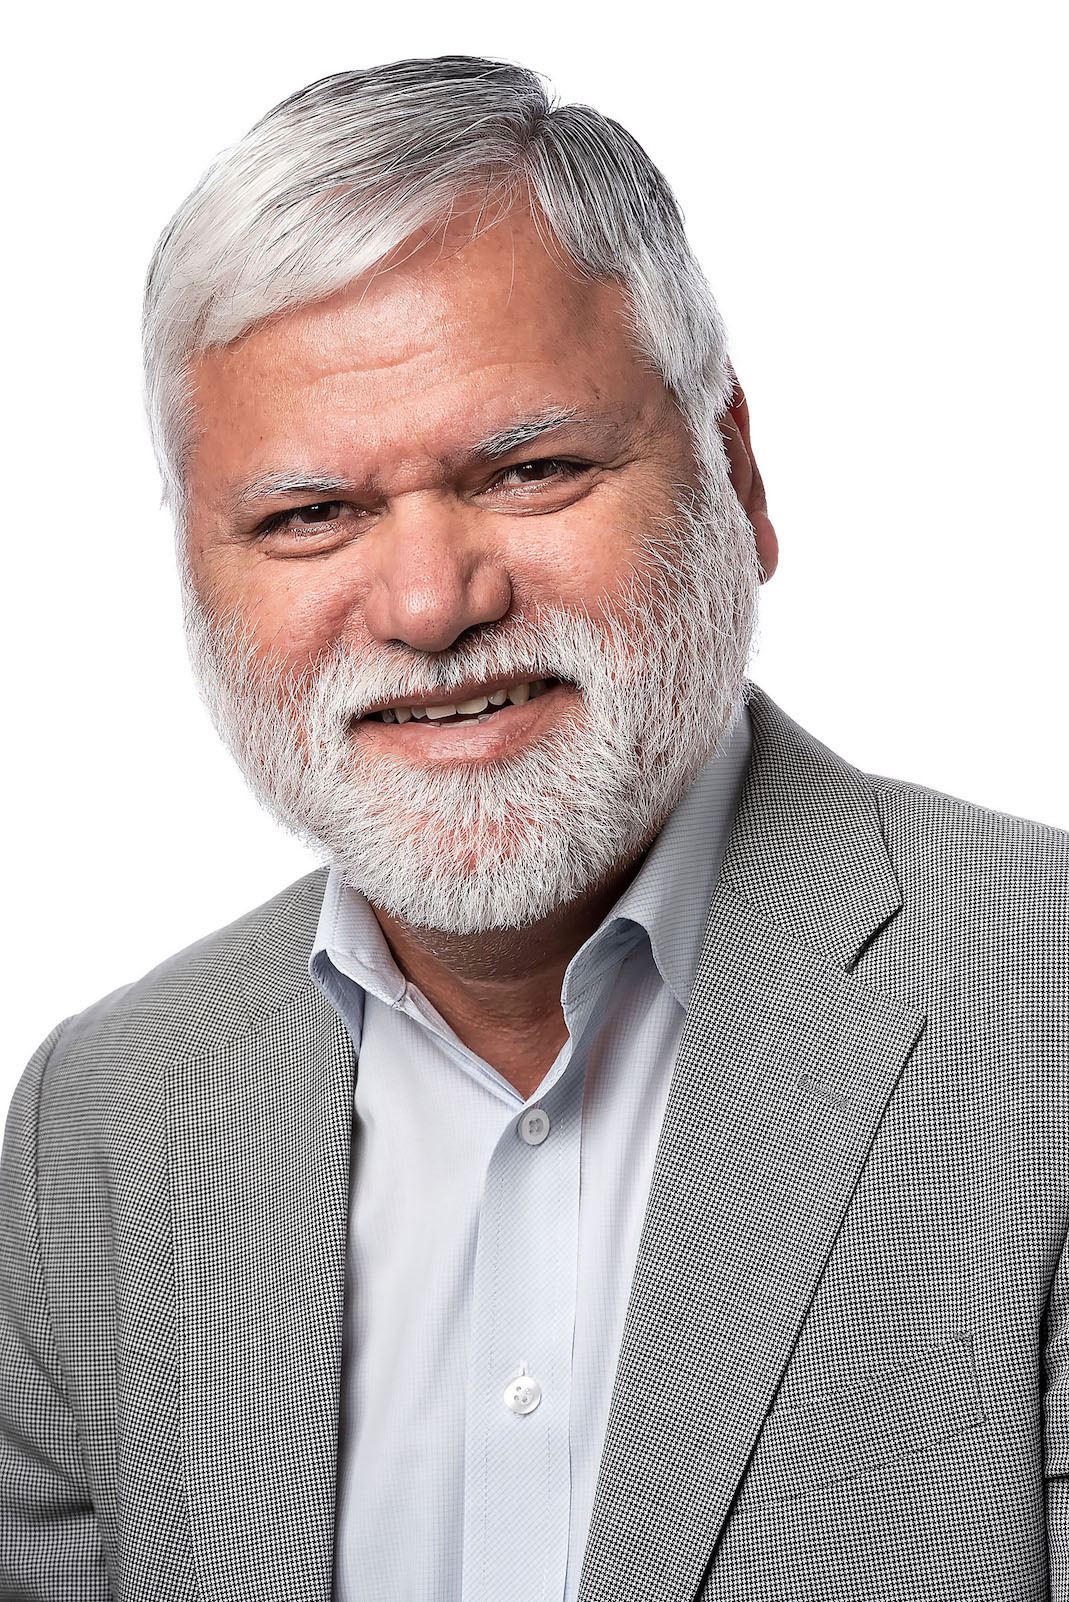 Profile picture of Pradeep Taneja